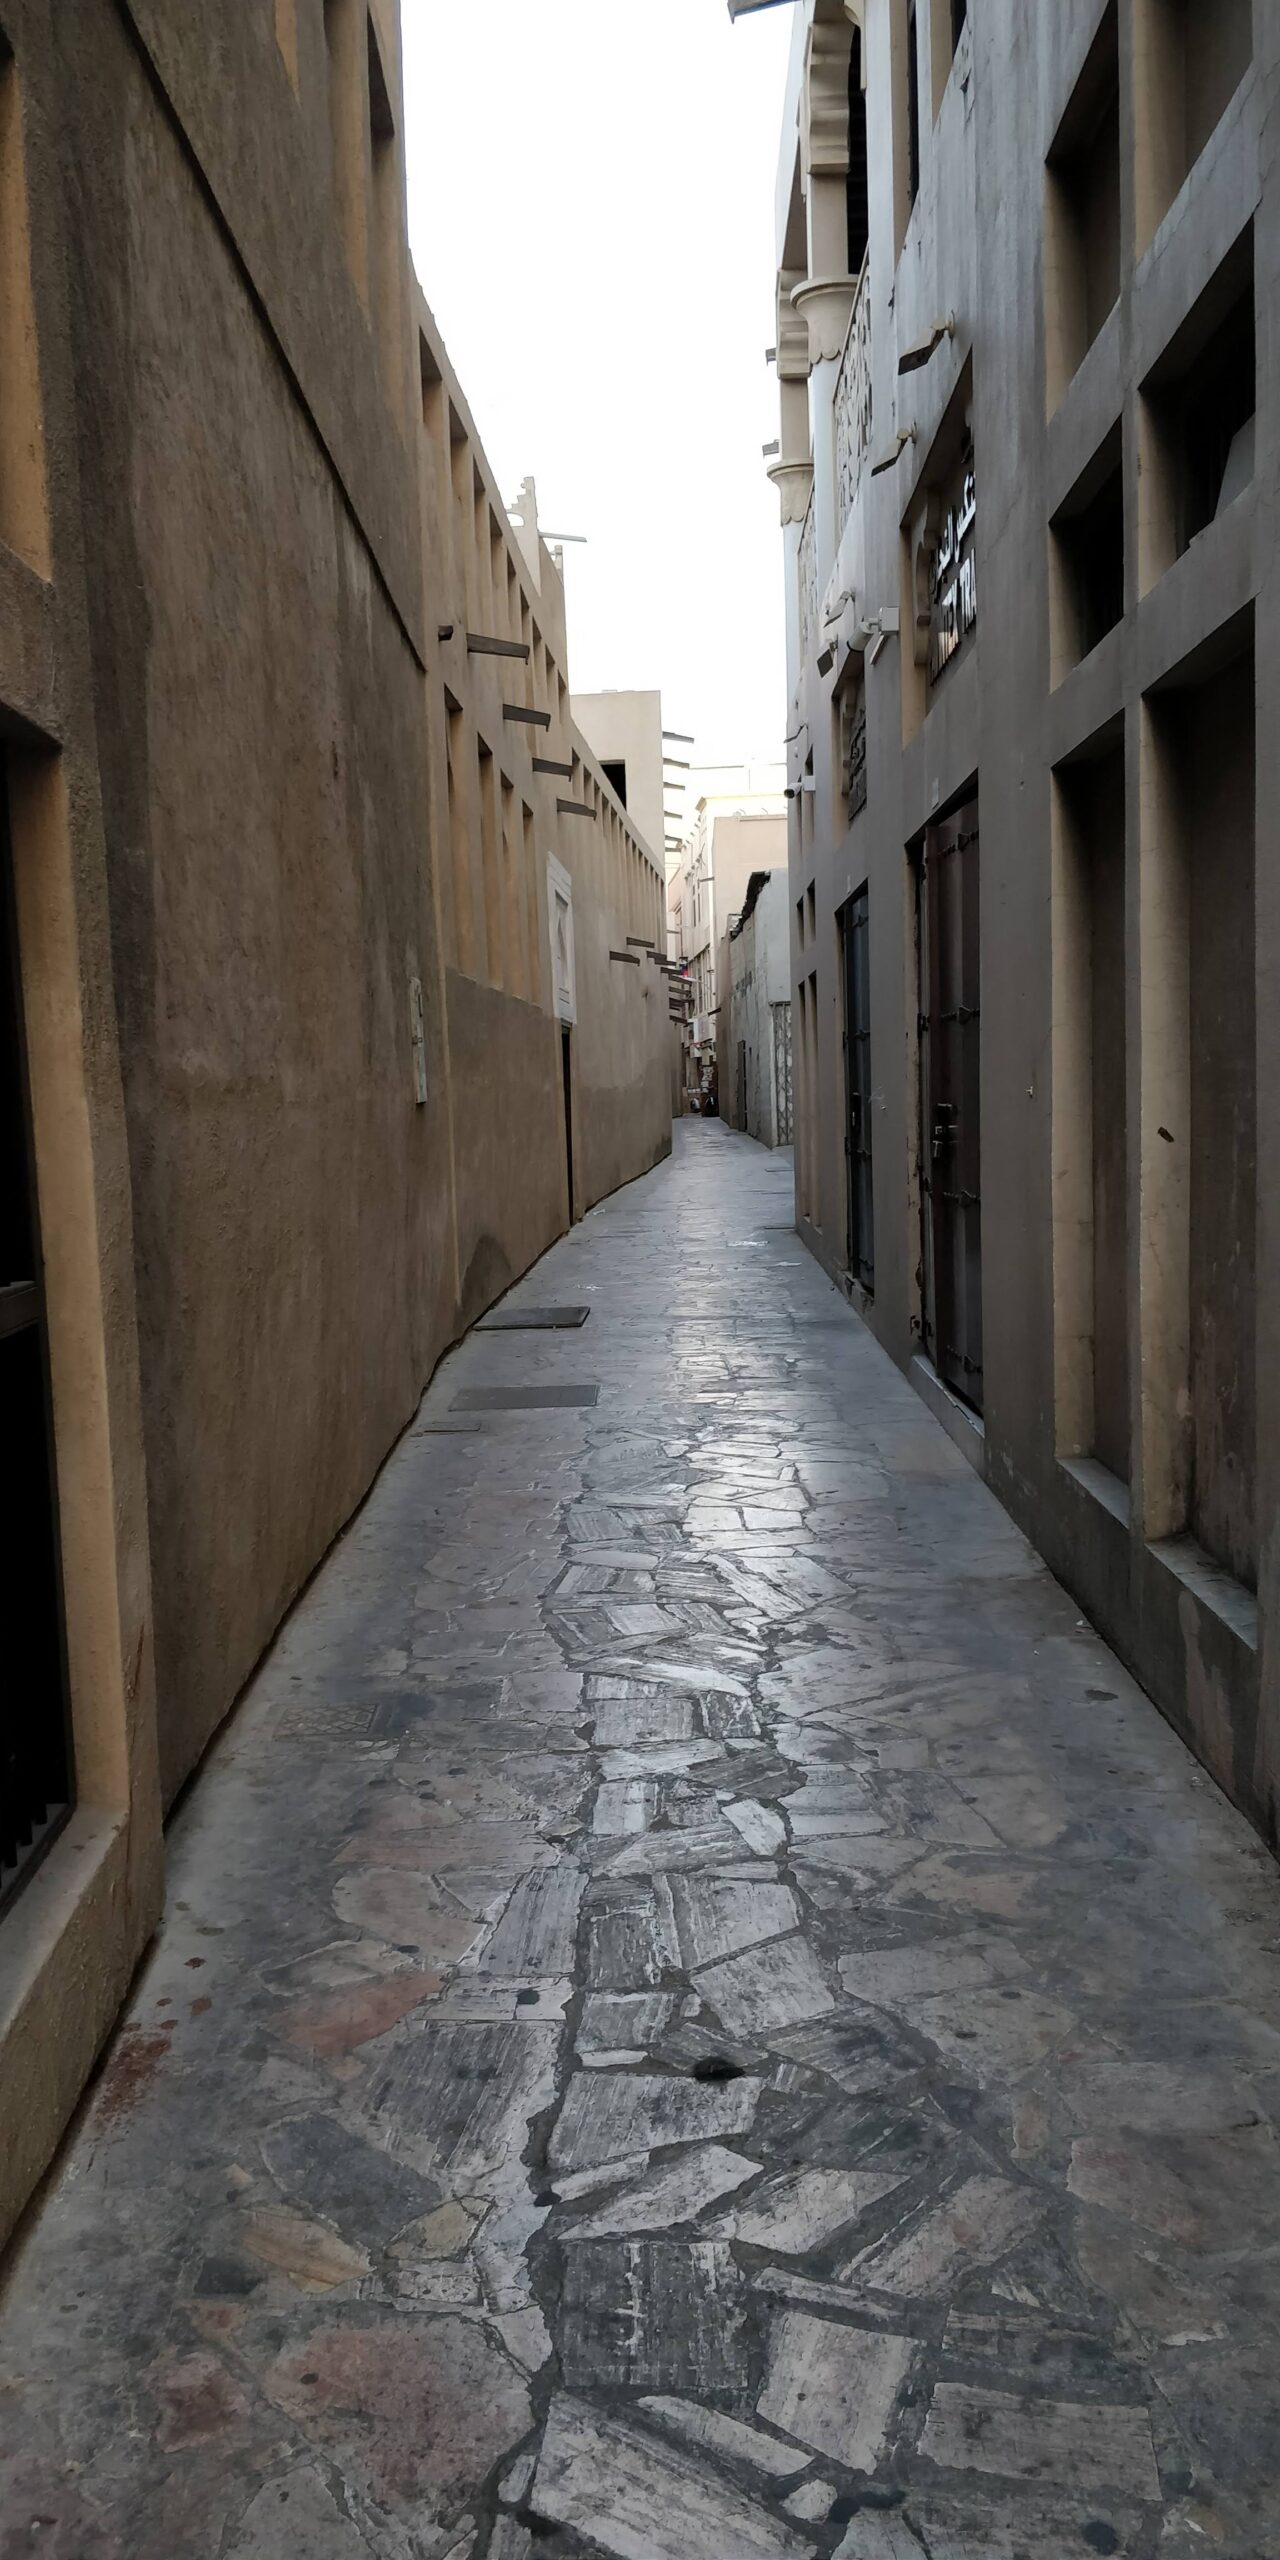 An Empty Alleyway in Deira near Old Heritage center and Bait Al Qadeem Restaurant